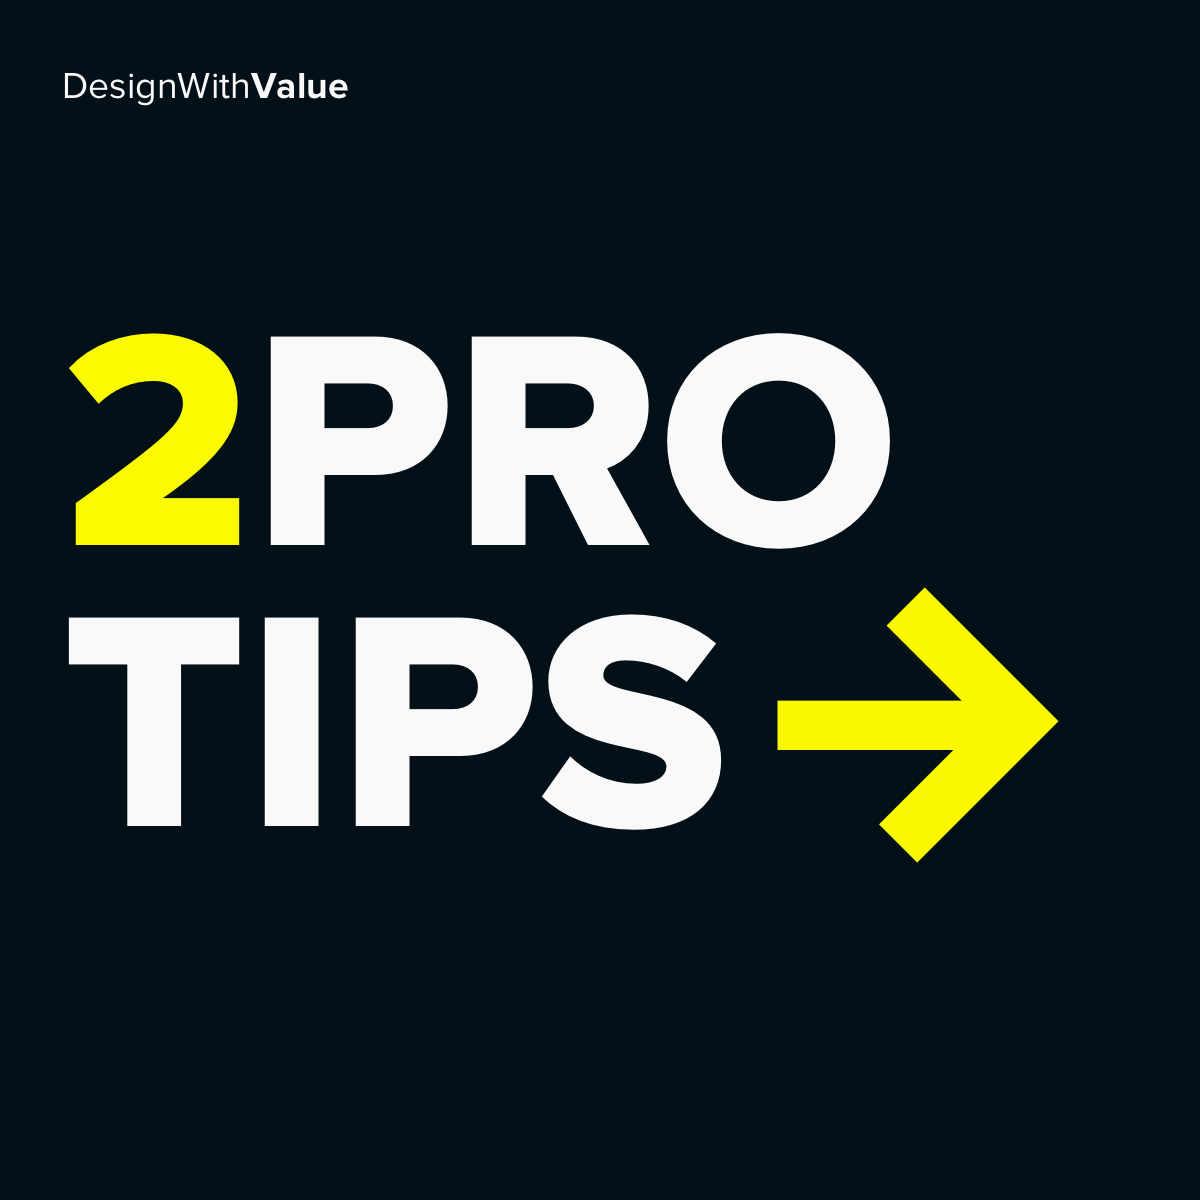 2 pro tips...